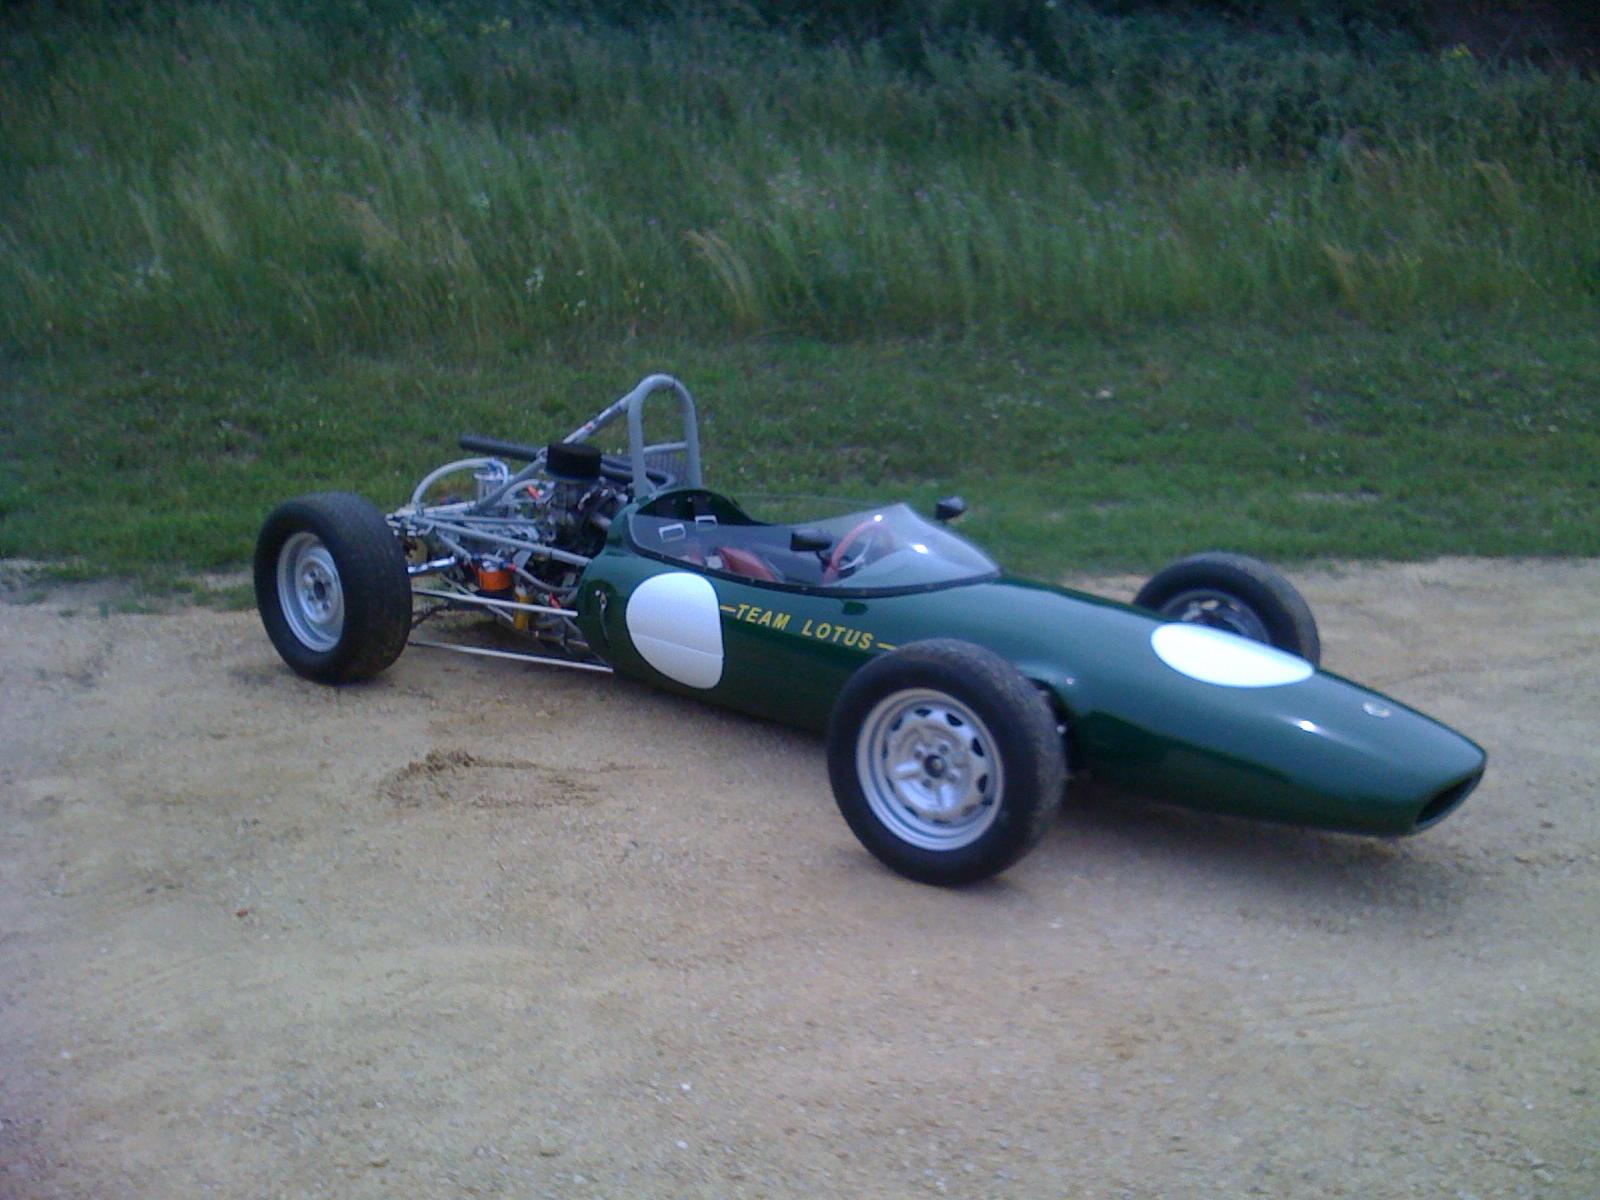 Formula Ford For Sale >> Boston Bruins Harry Lotus 51 Formula Ford For Sale